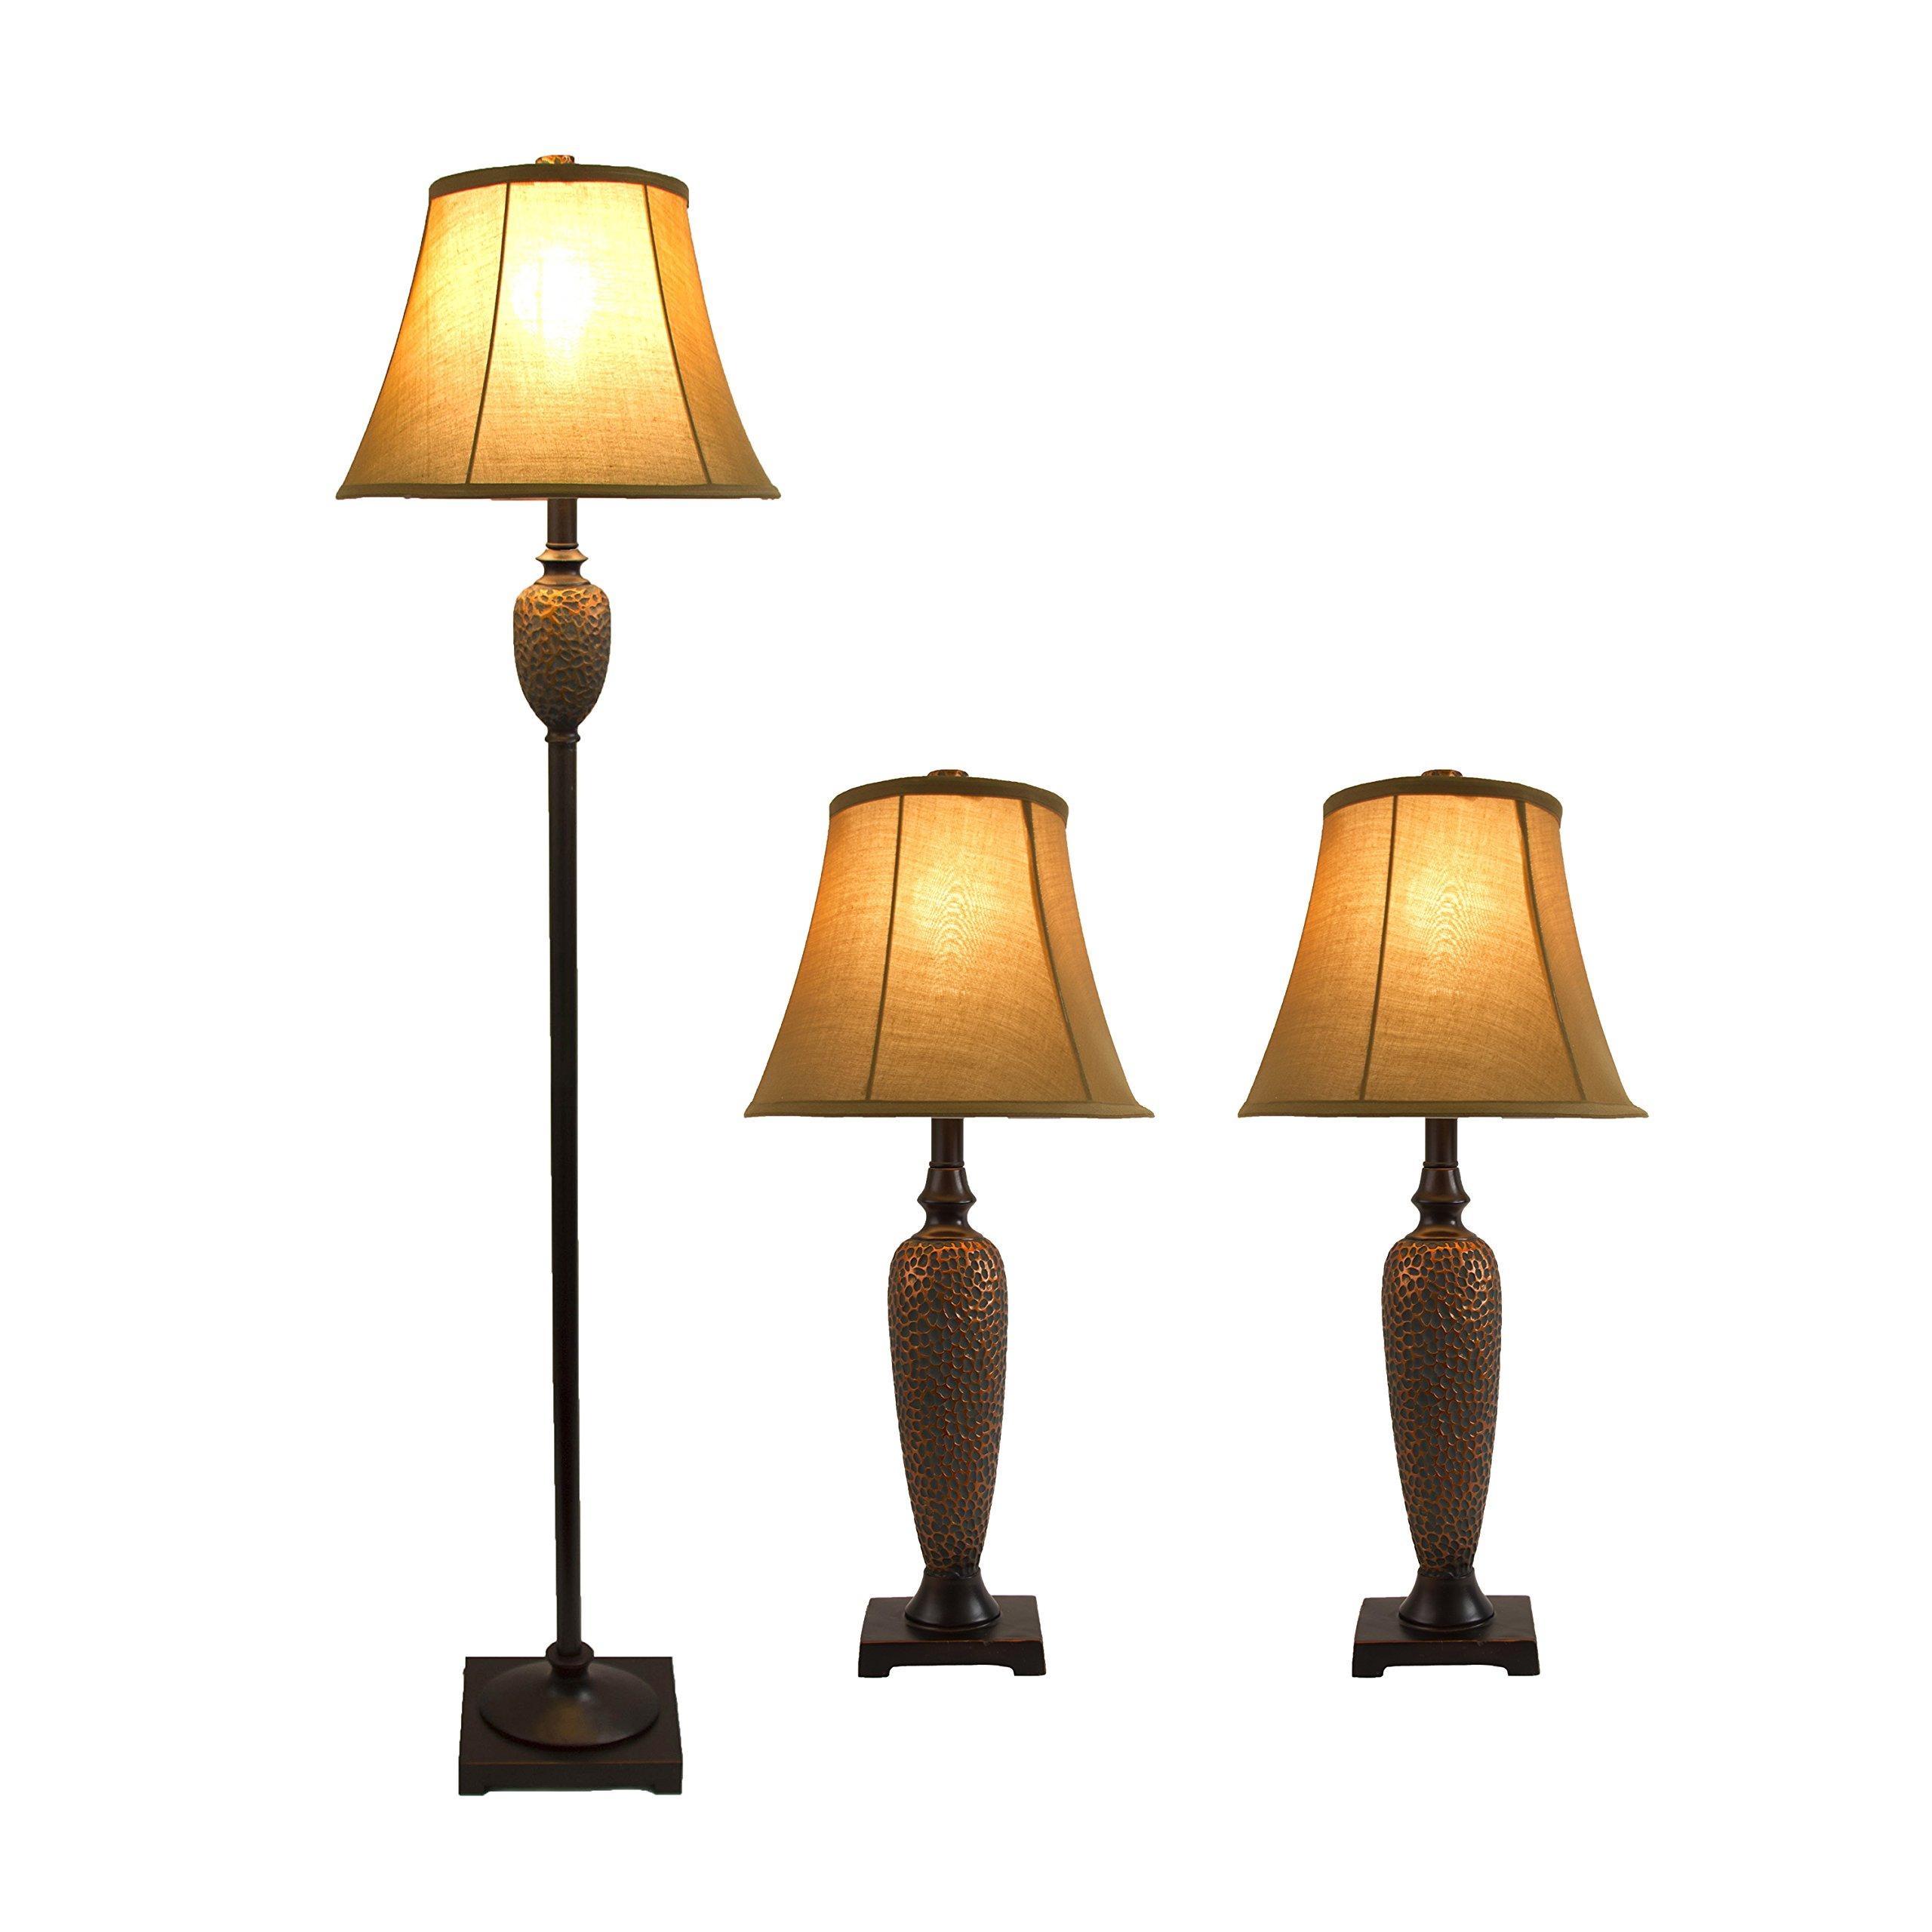 Elegant Designs LC1000-HBZ Lamp Set by Elegant Designs (Image #3)